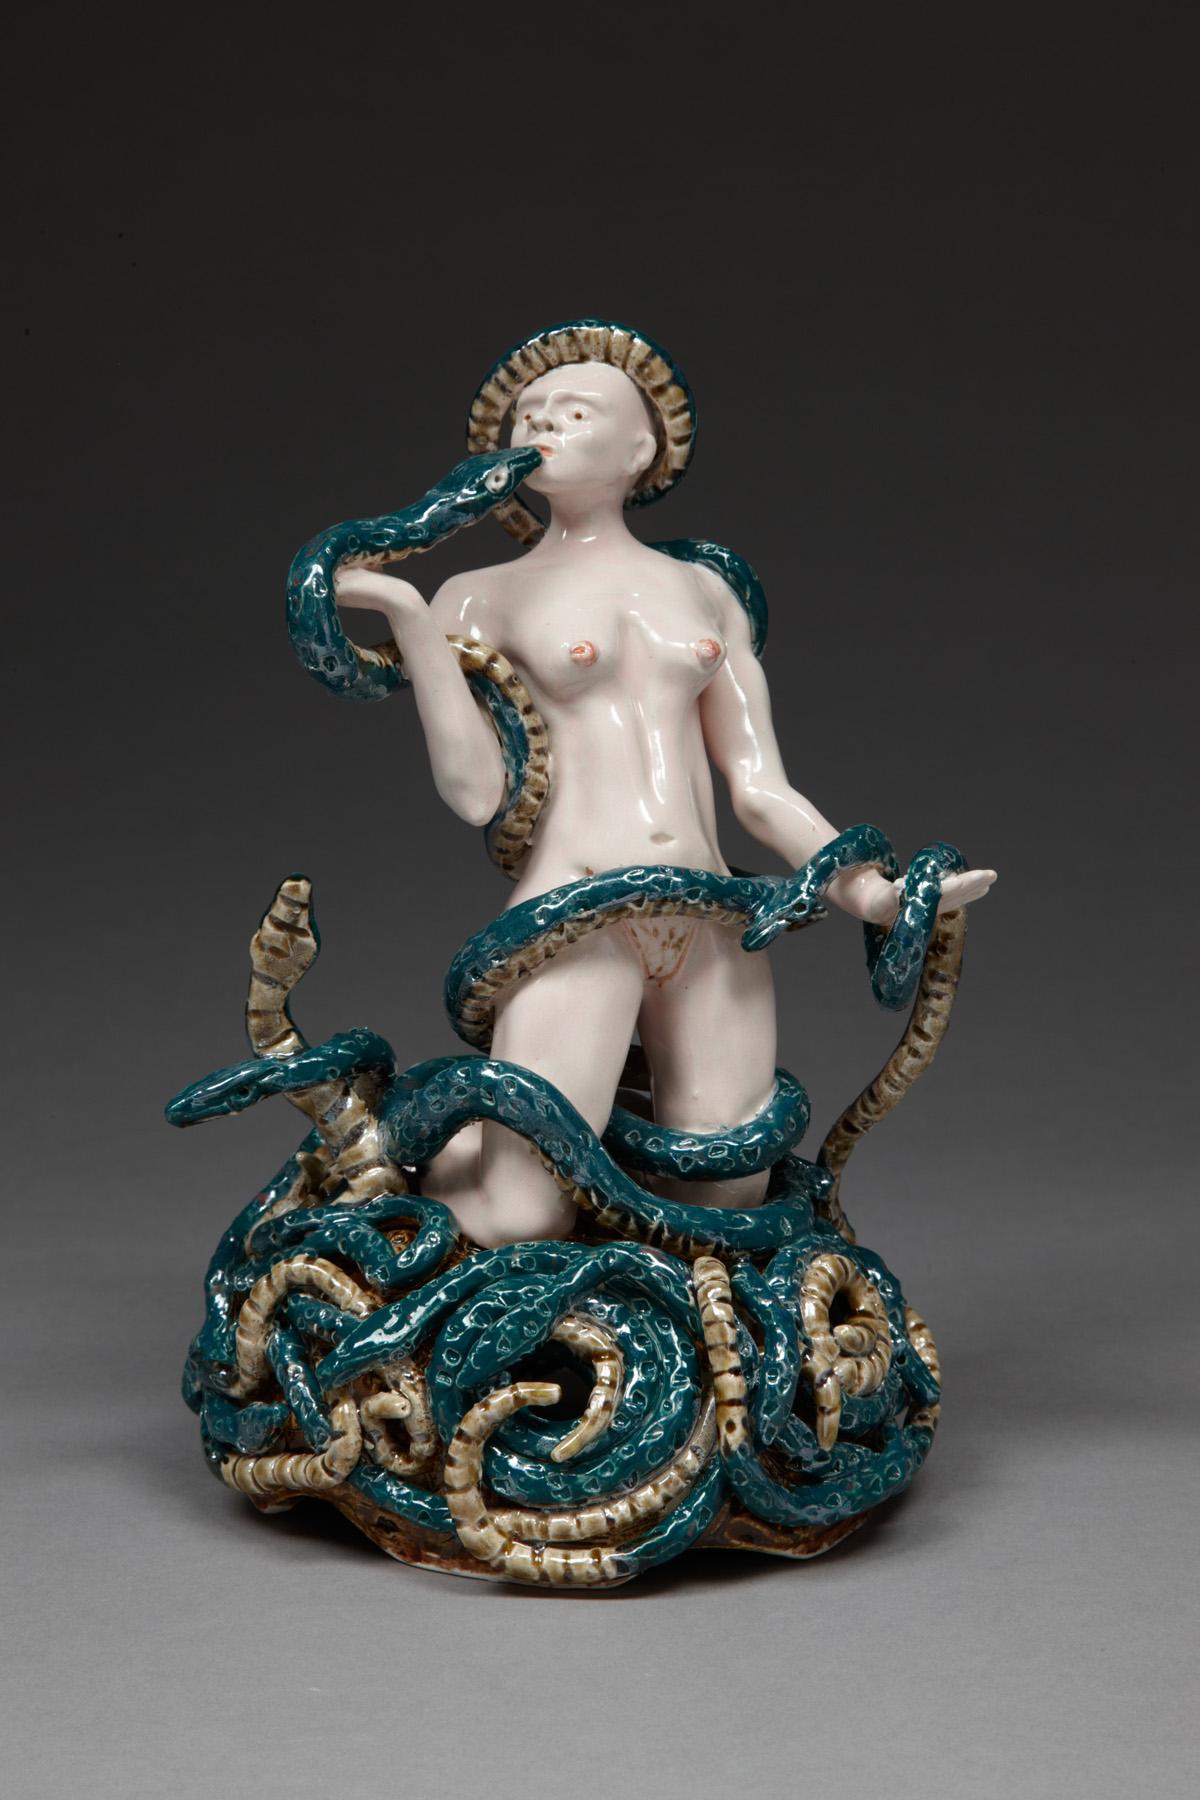 The Embrace, 2010, stoneware, glaze, lustre, H 21cm x W 16cm .jpg